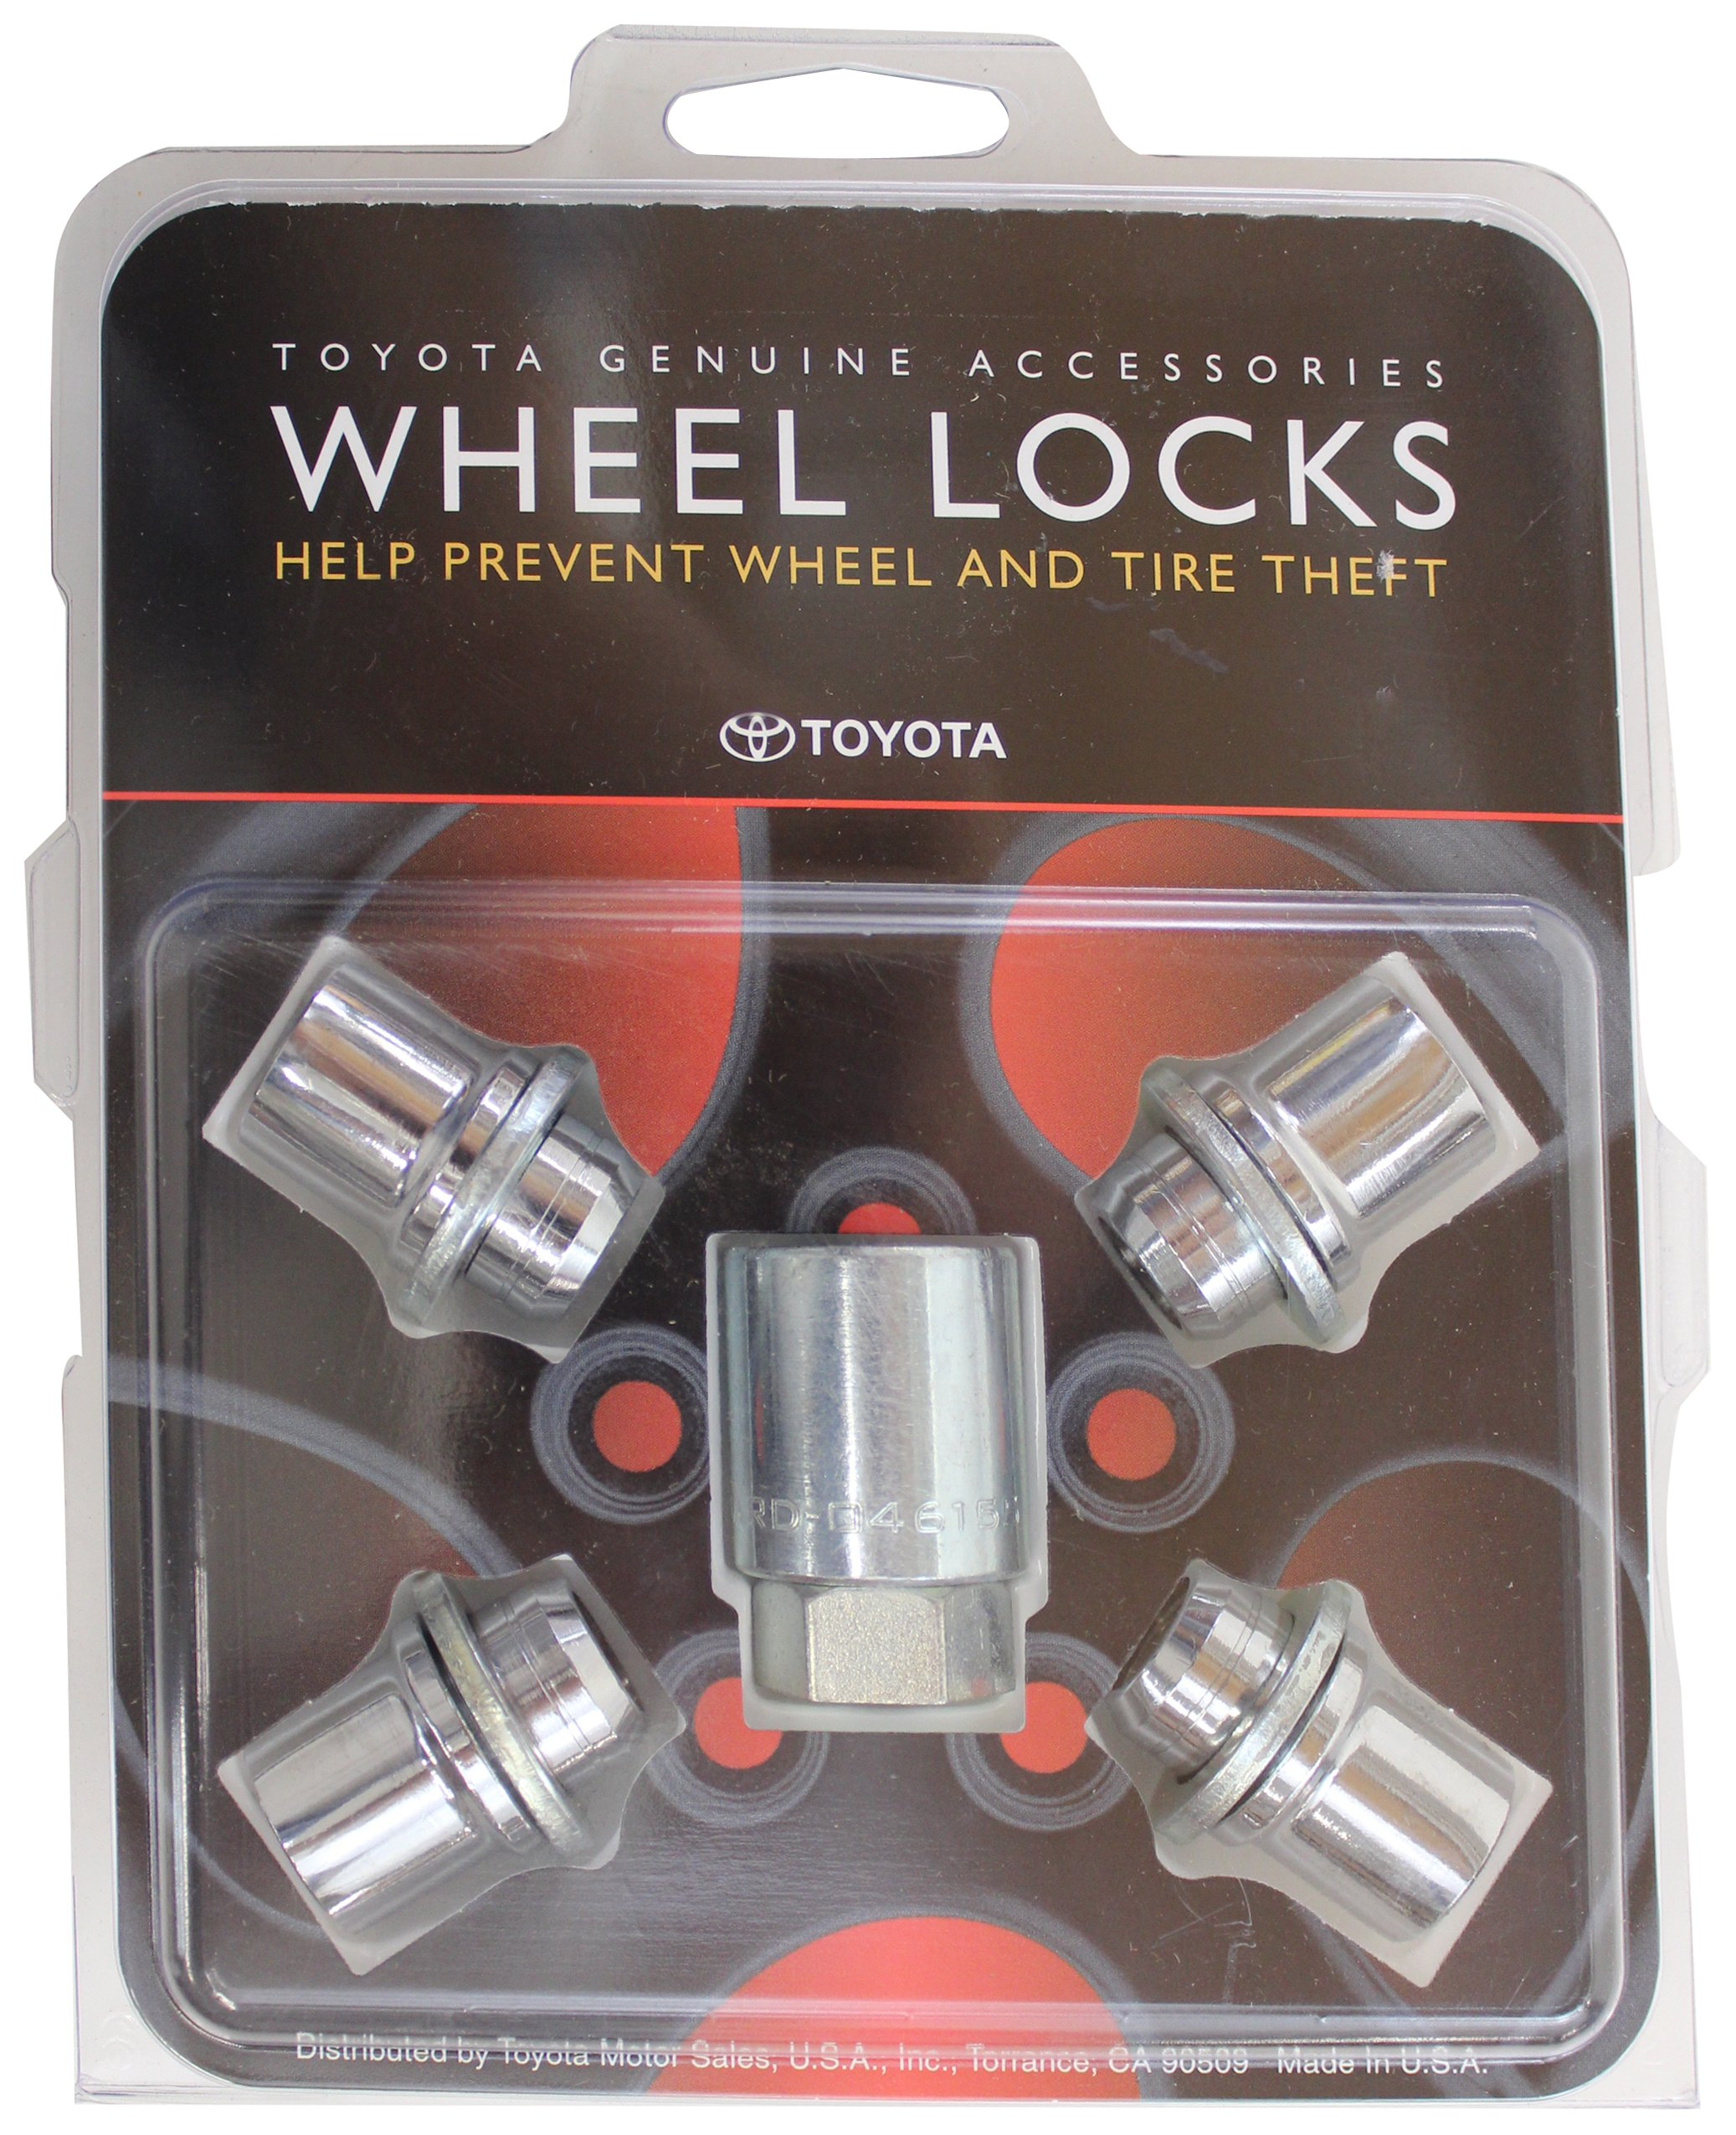 TOYOTA Genuine Accessories 00276-00900 Wheel Lock by TOYOTA